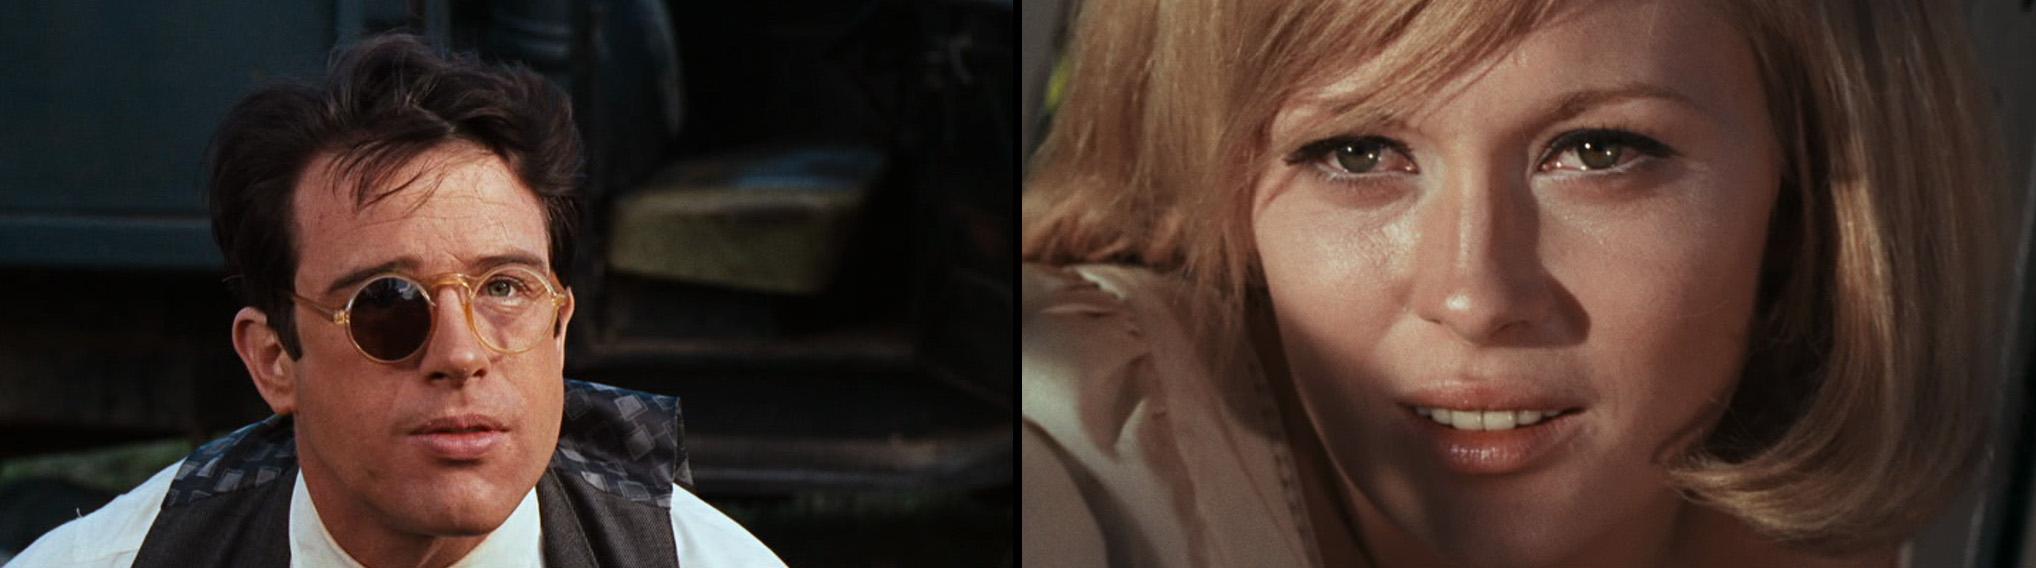 Bonnie og Clyde.